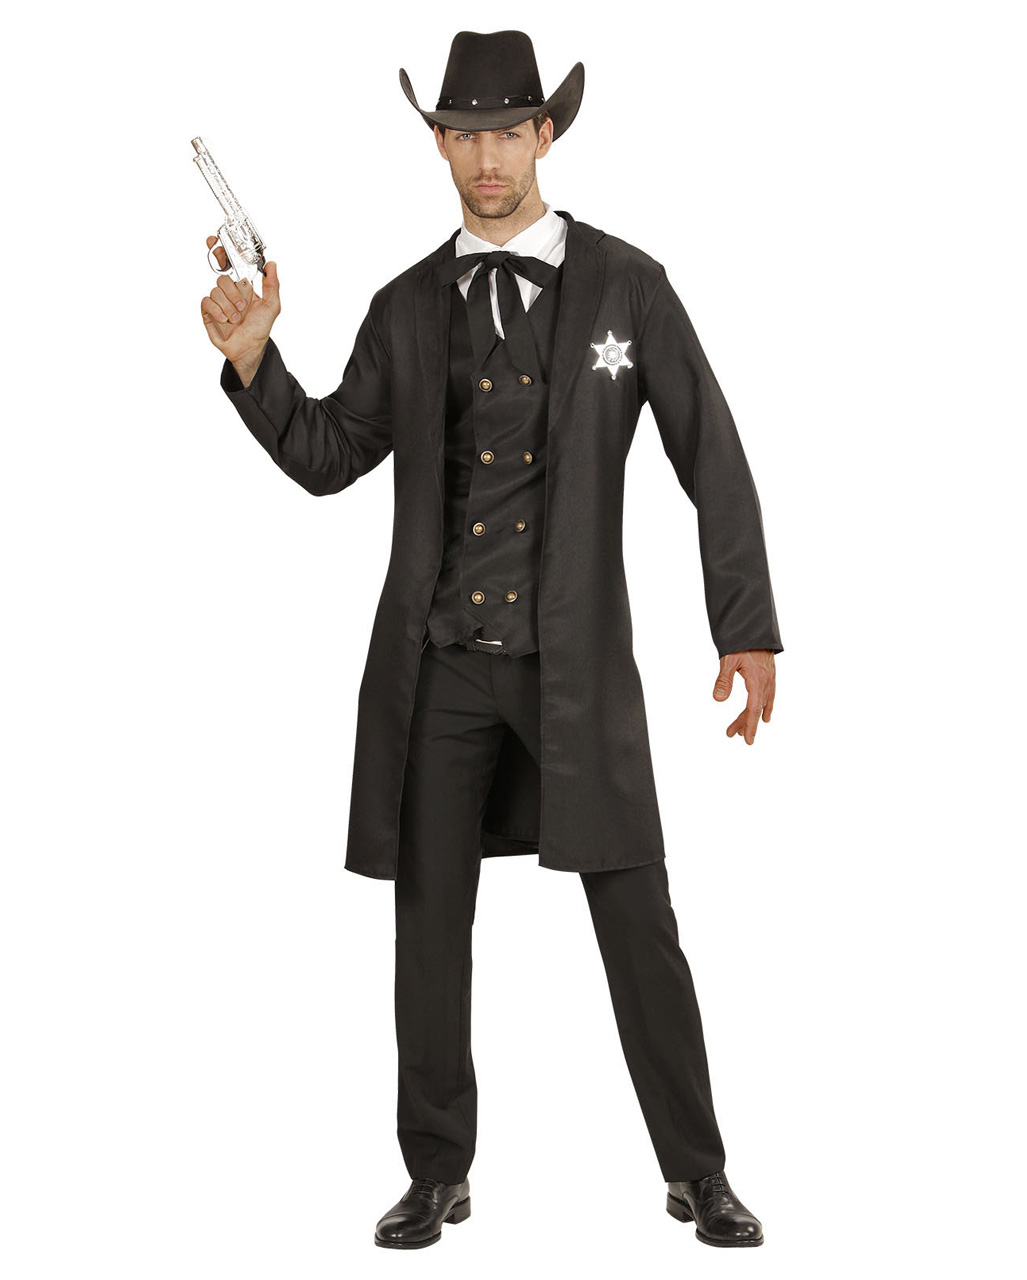 ... Western Sheriff Costume 4 Pieces  sc 1 st  Horror-Shop.com & Western Sheriff Costume 4 Pieces Herrenkostüm | horror-shop.com